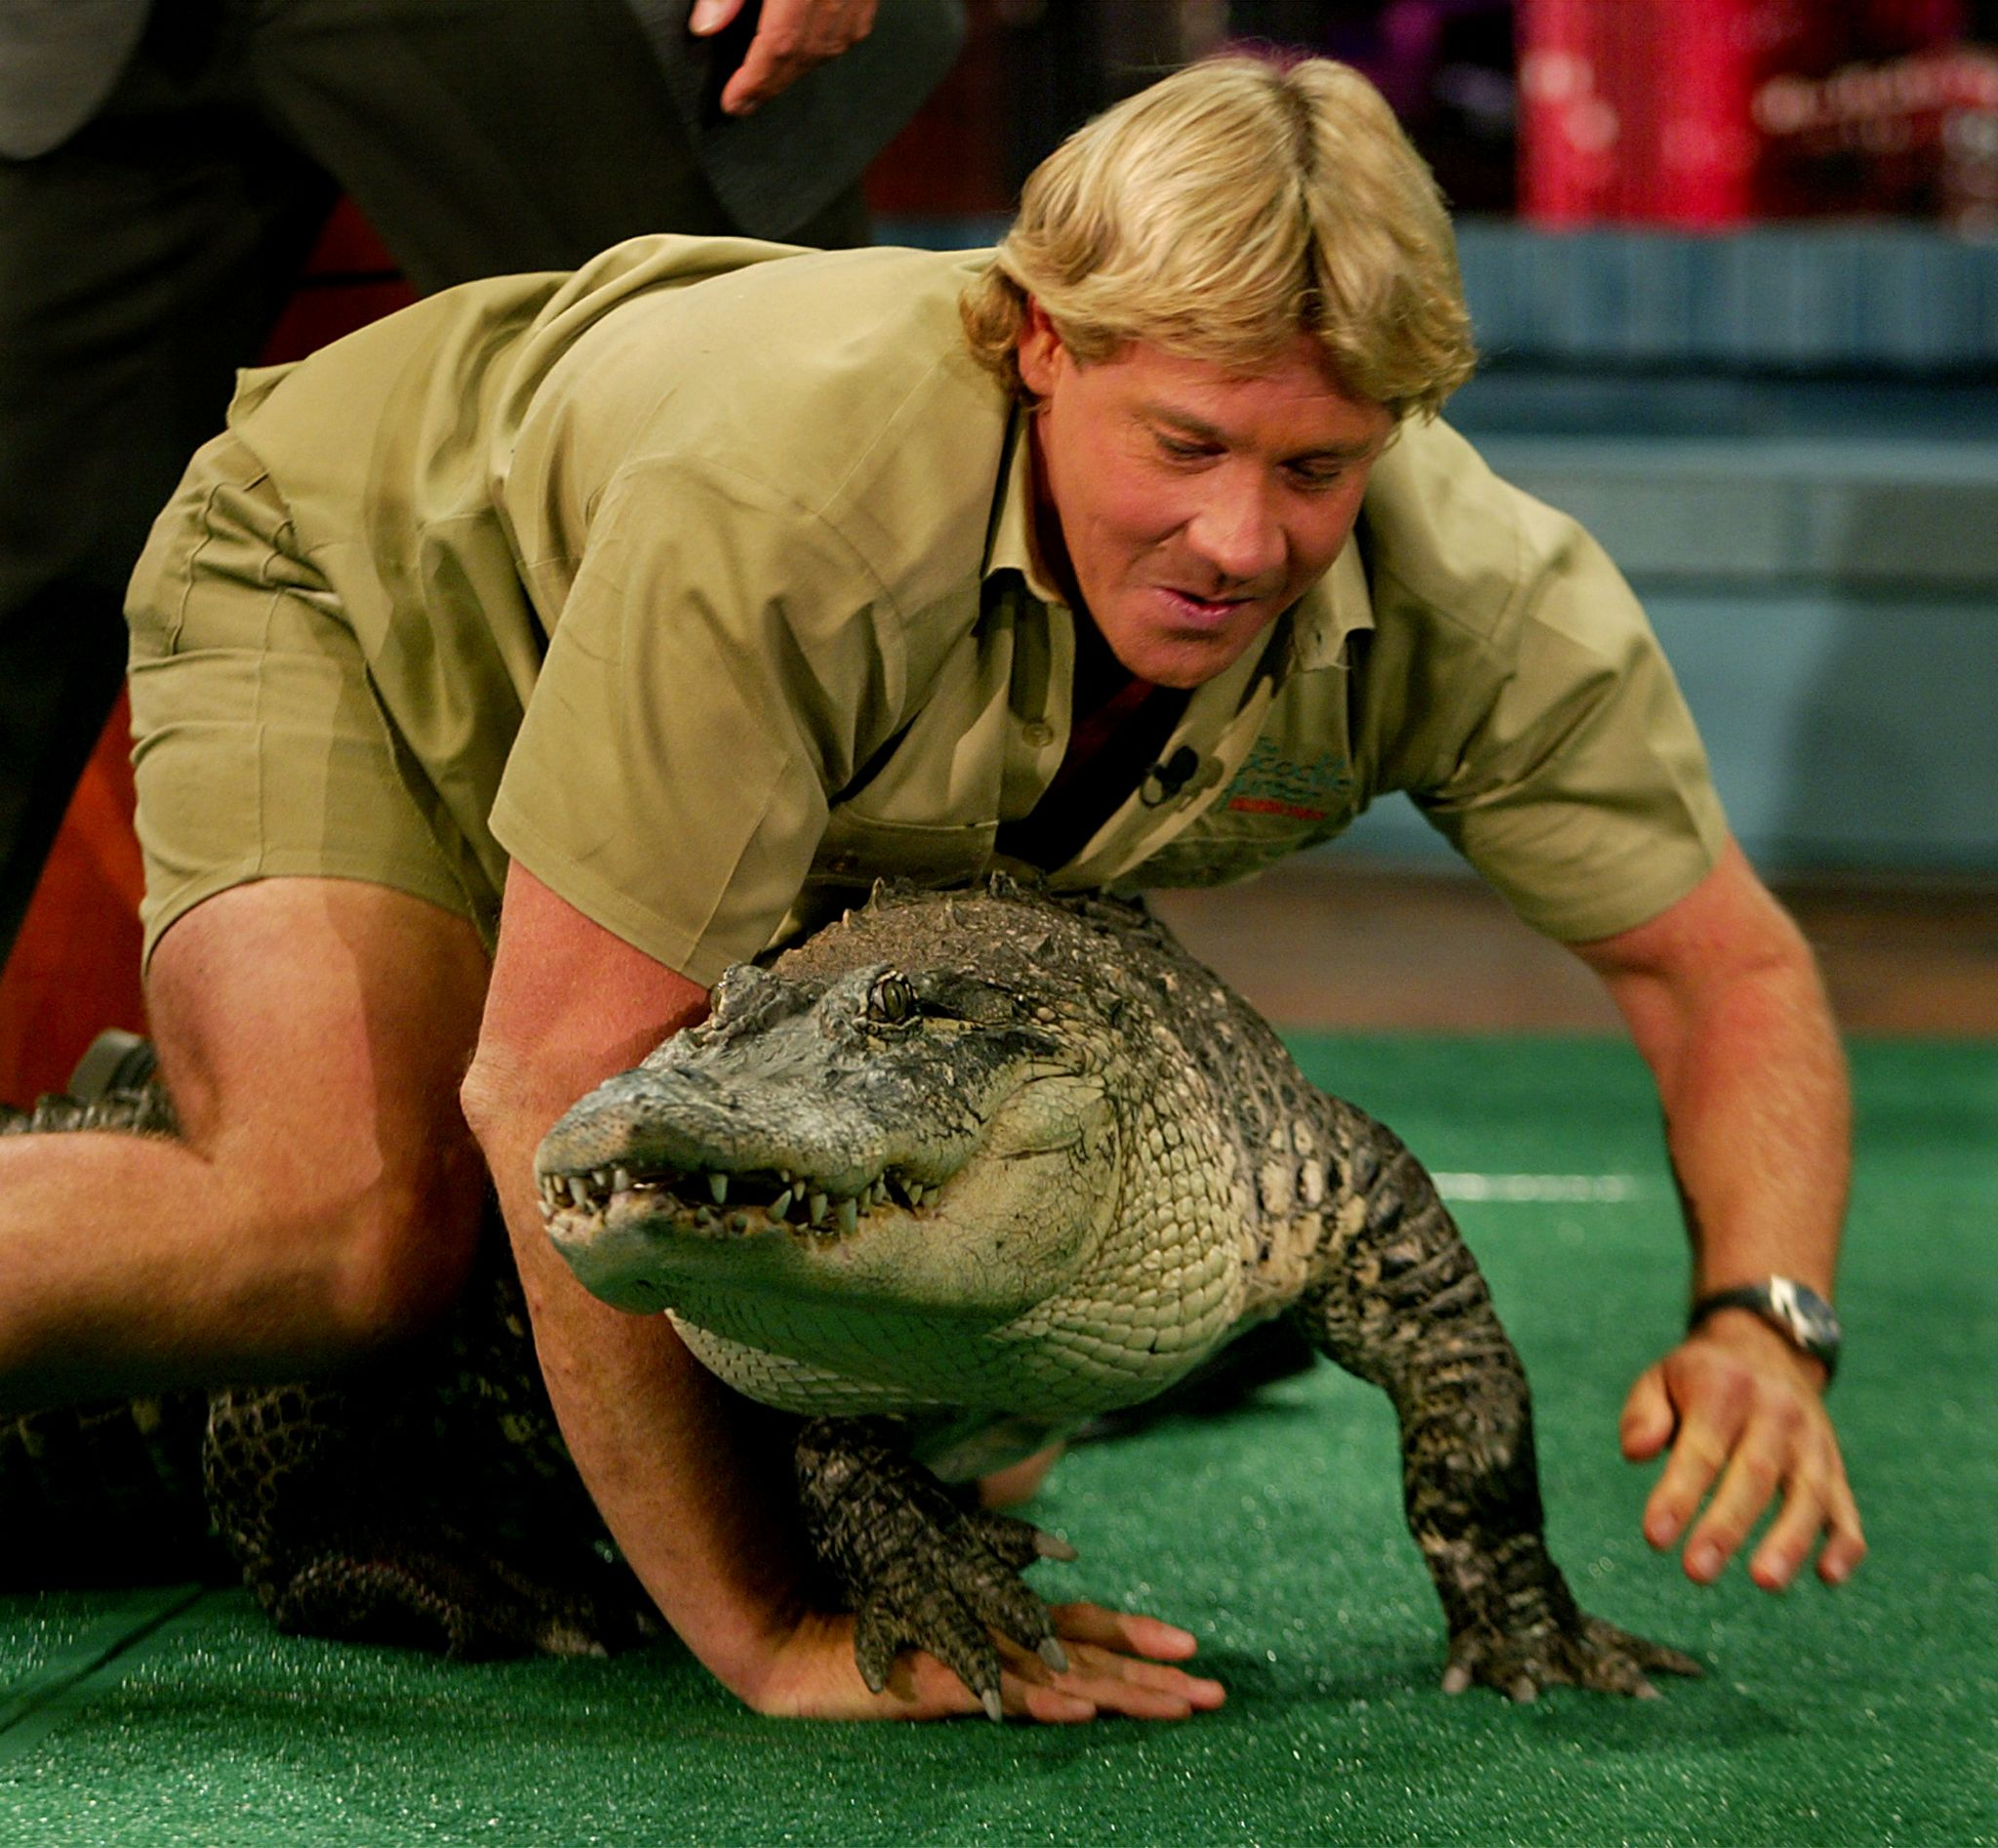 Steve Irwin crawling with a crocodile